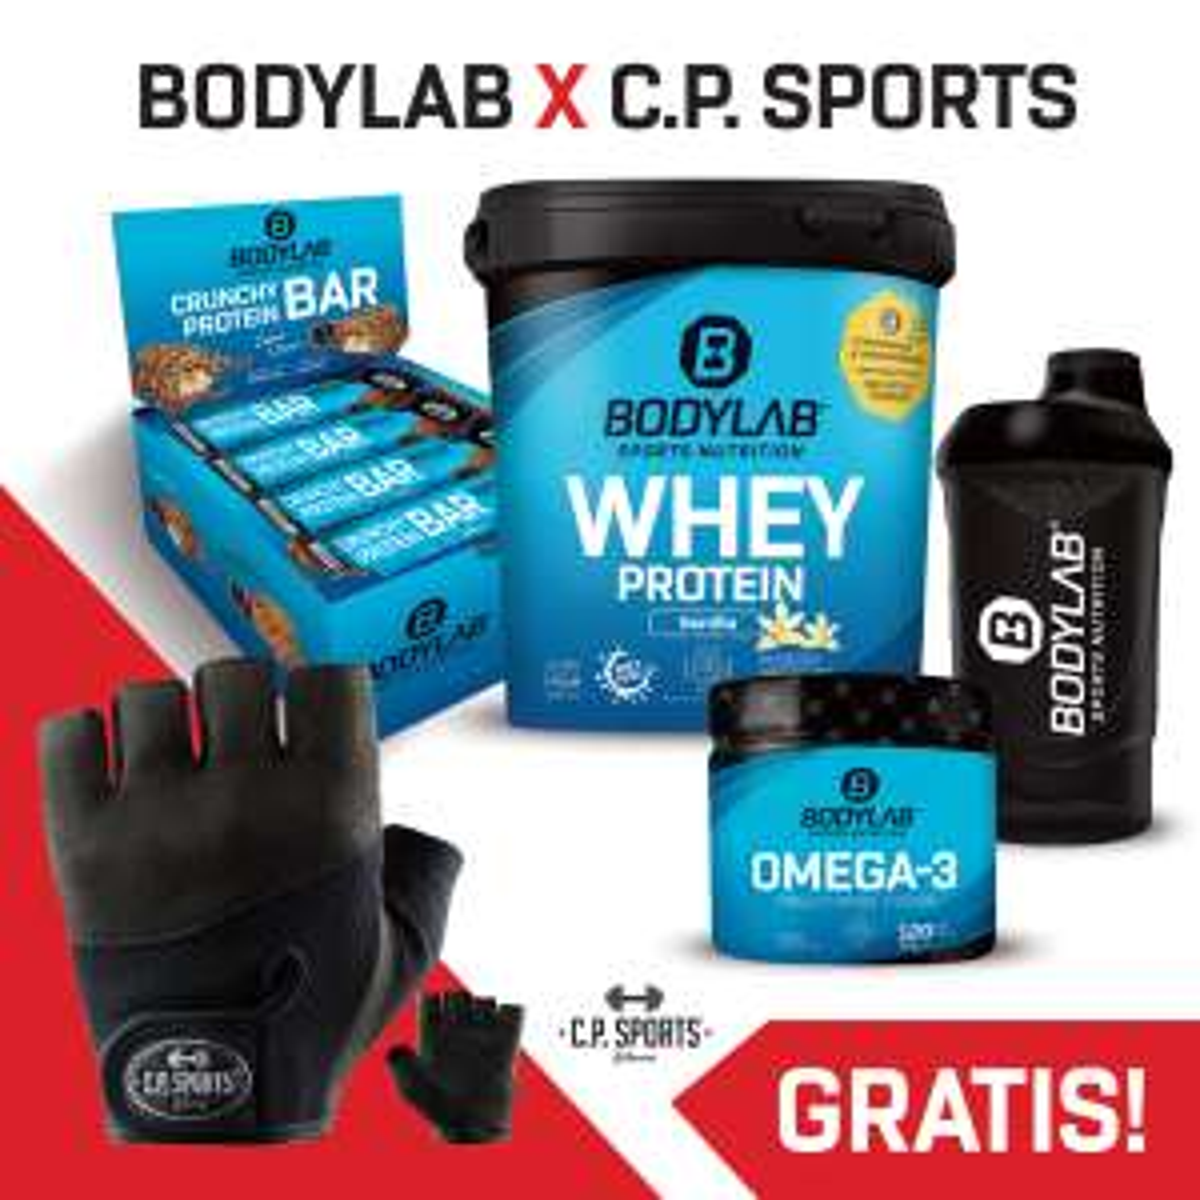 Bundle: 1kg Bodylab24 Whey Protein + 12x 64g Crunchy Protein Bar + 120 Kapseln Omega 3 + Shaker + Handschuhe oder (!) Handgelenksbandagen